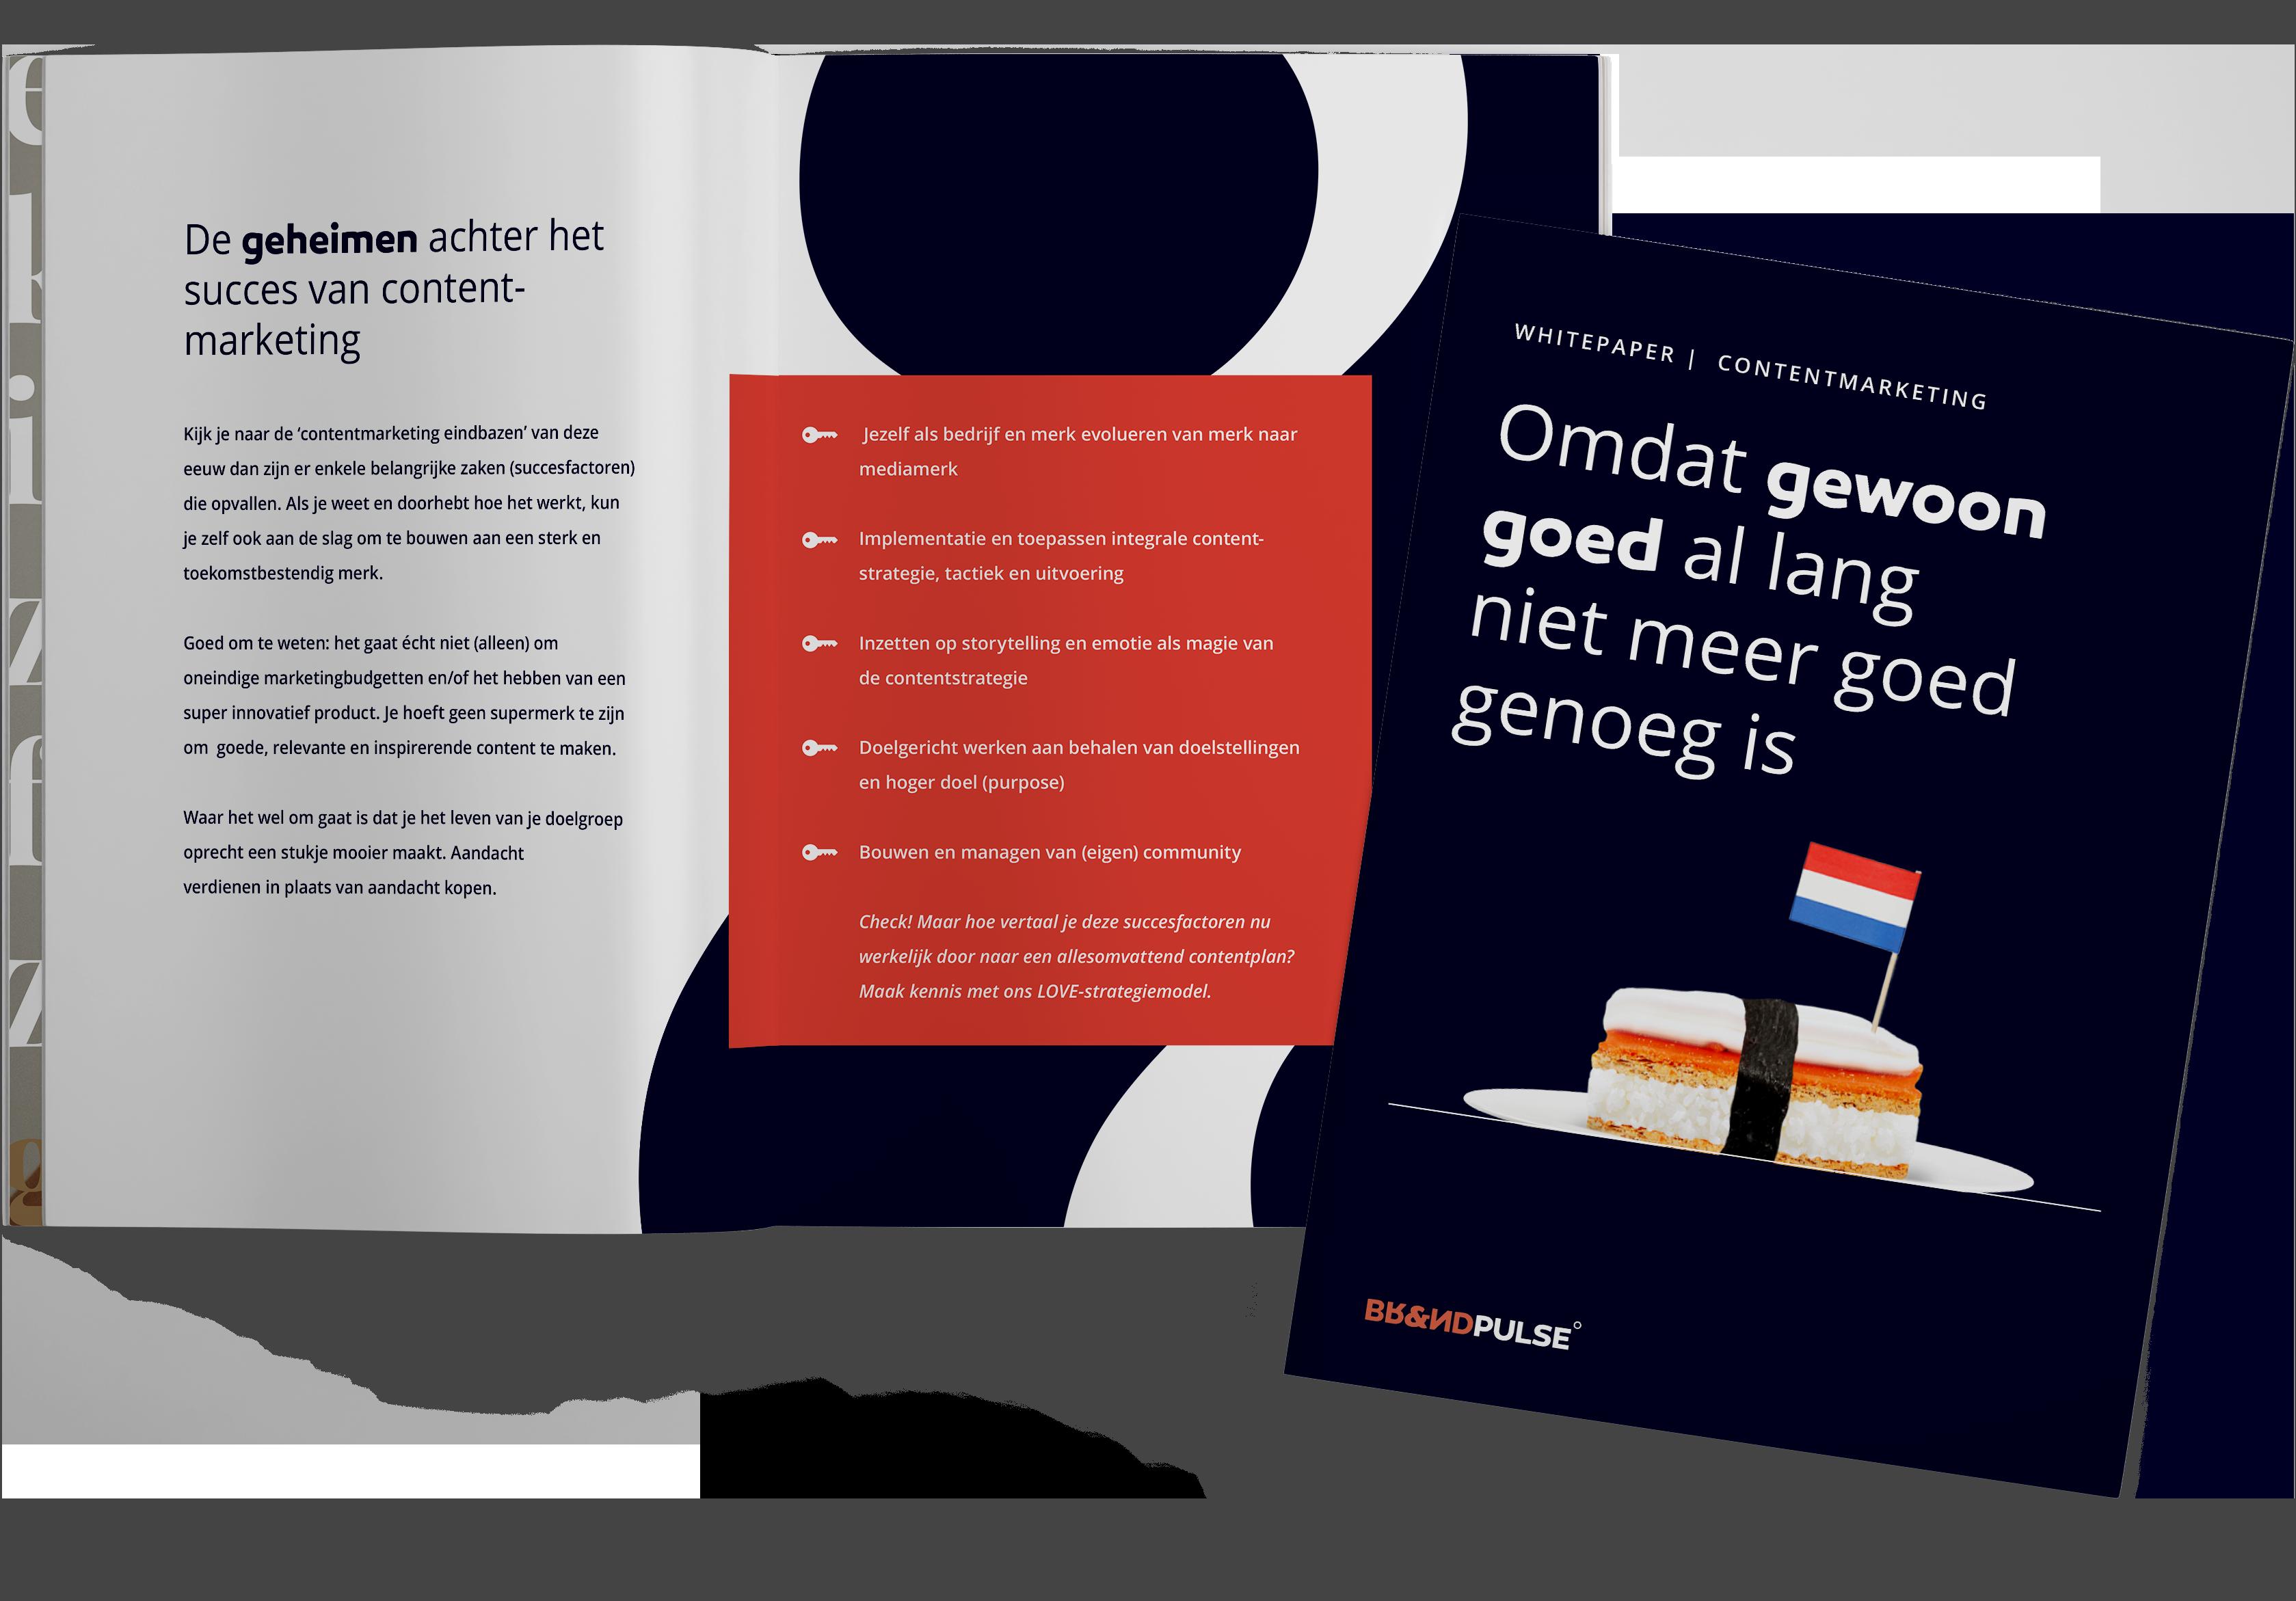 whitepaper contentmarketing Brandpulse